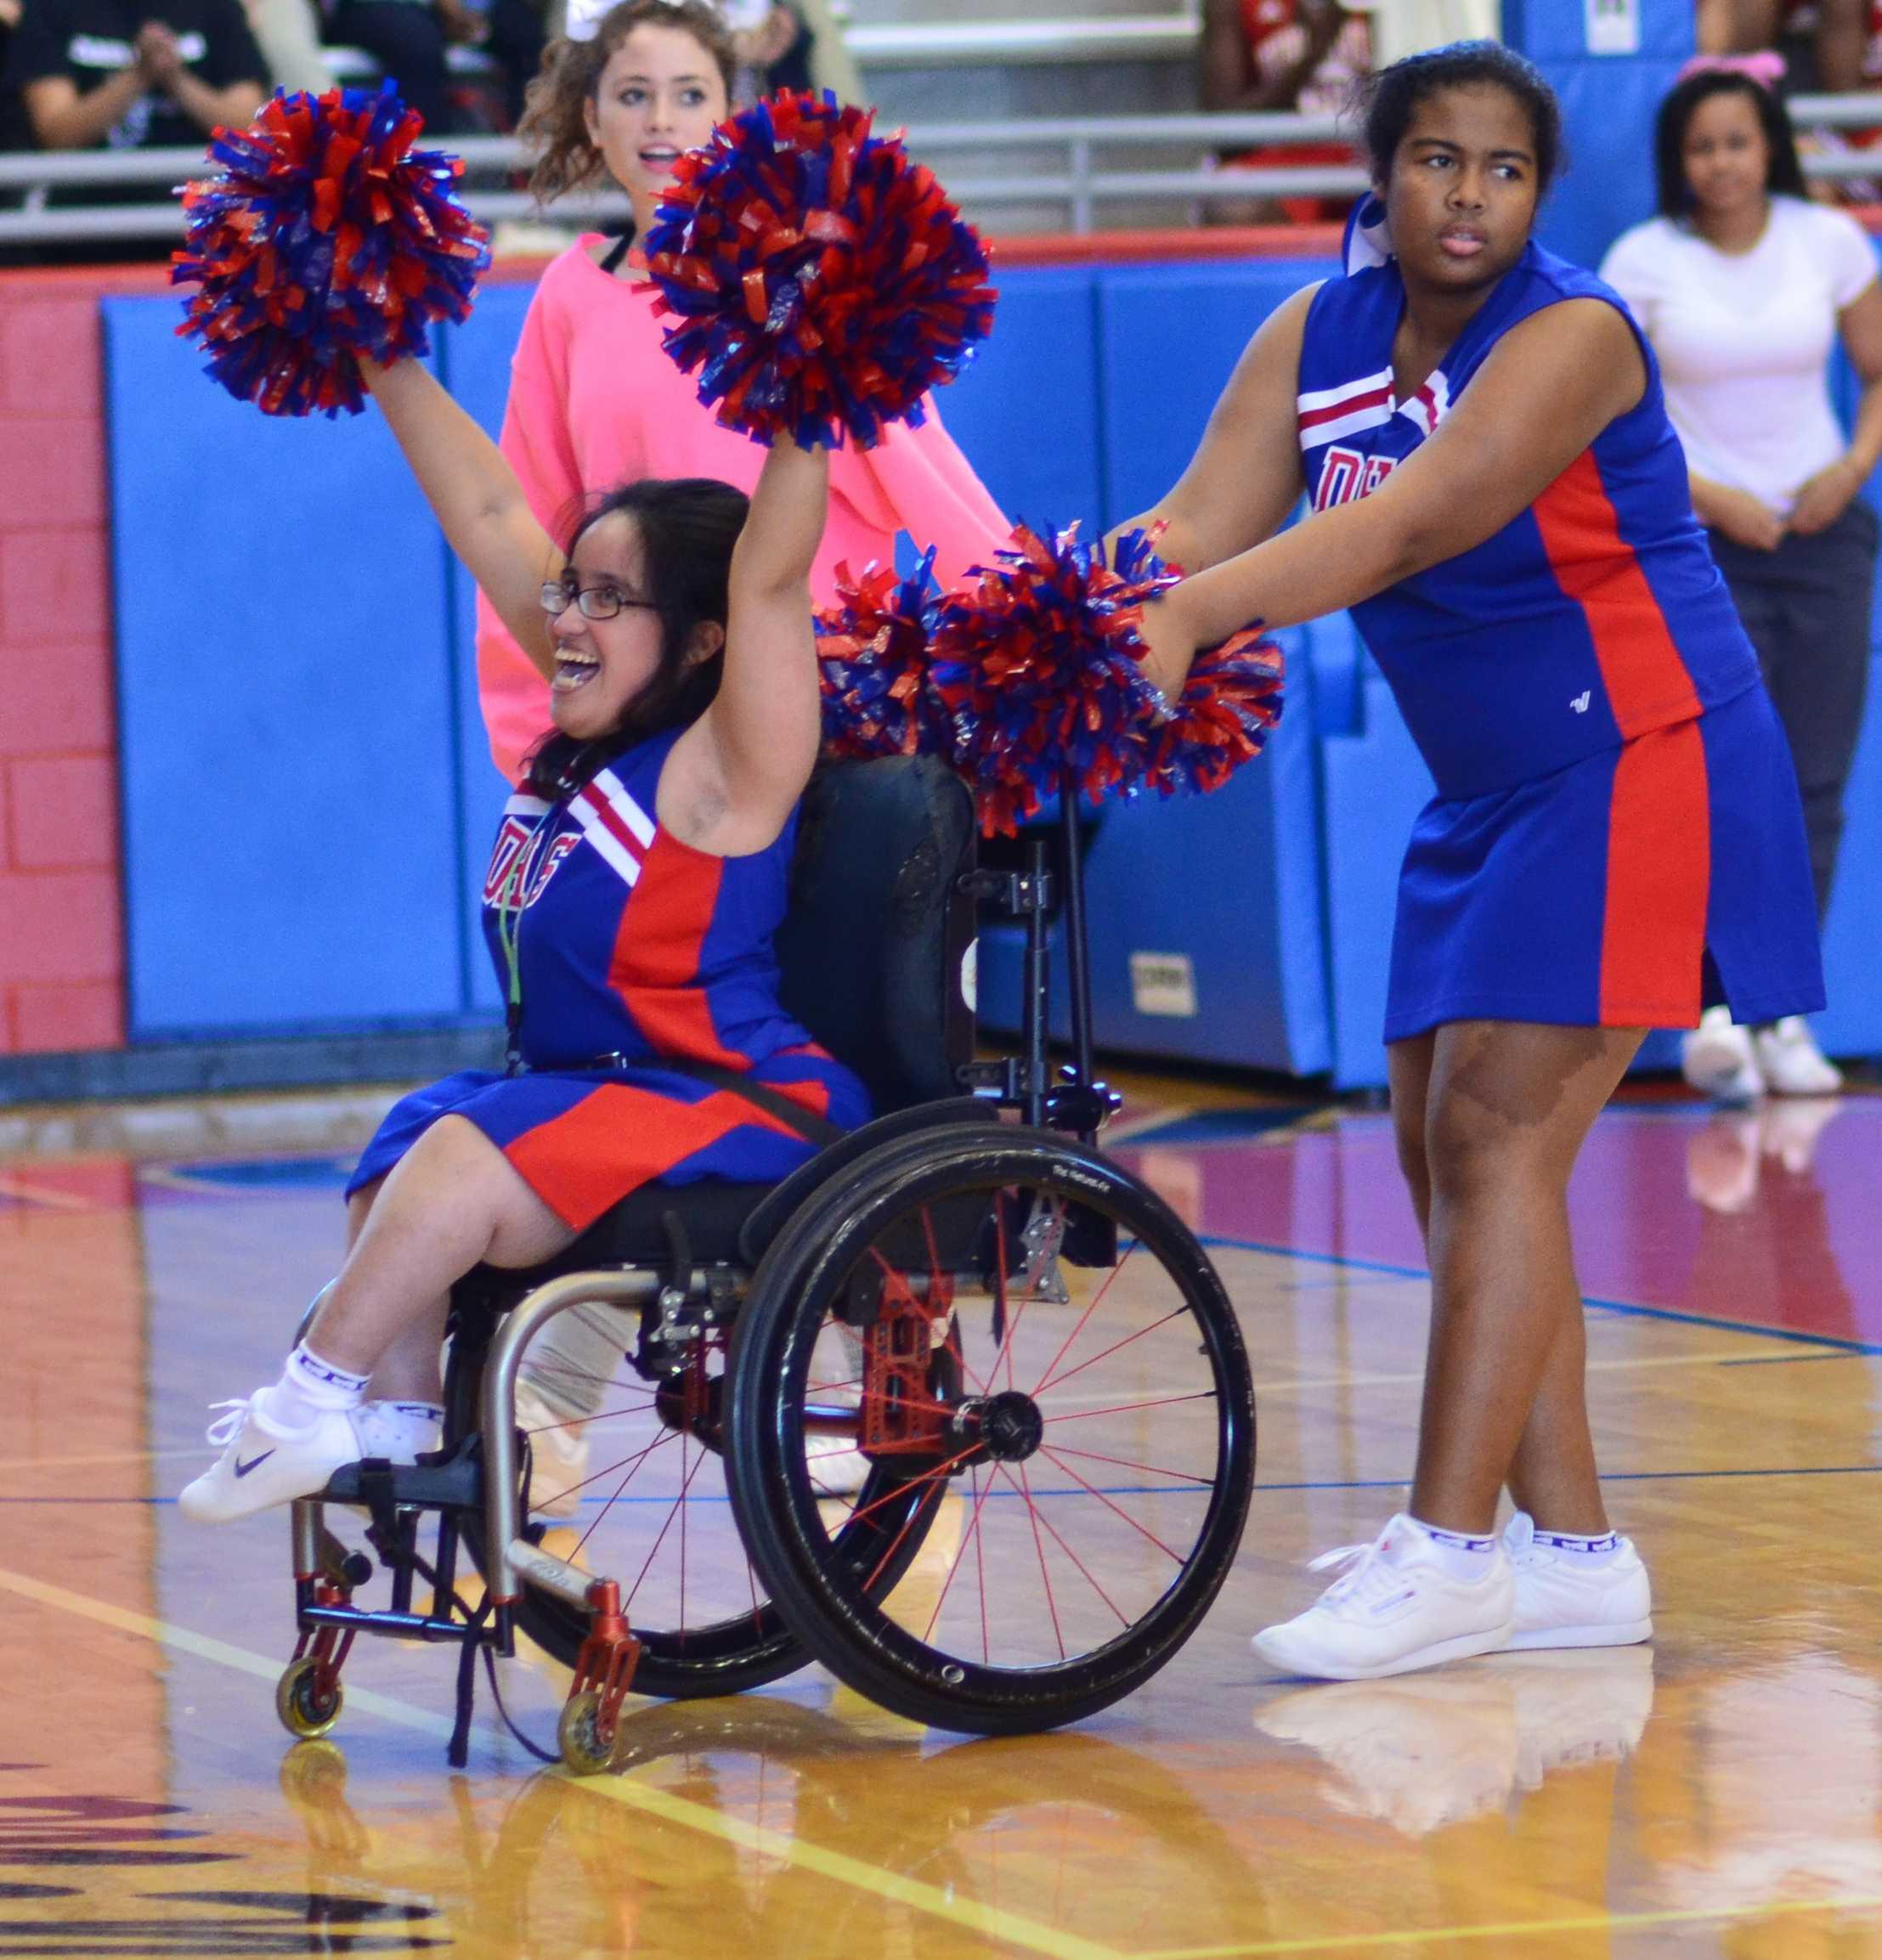 Senior Sparklers Cheer captain Genesis Montanez pumps up the crowd as she chants